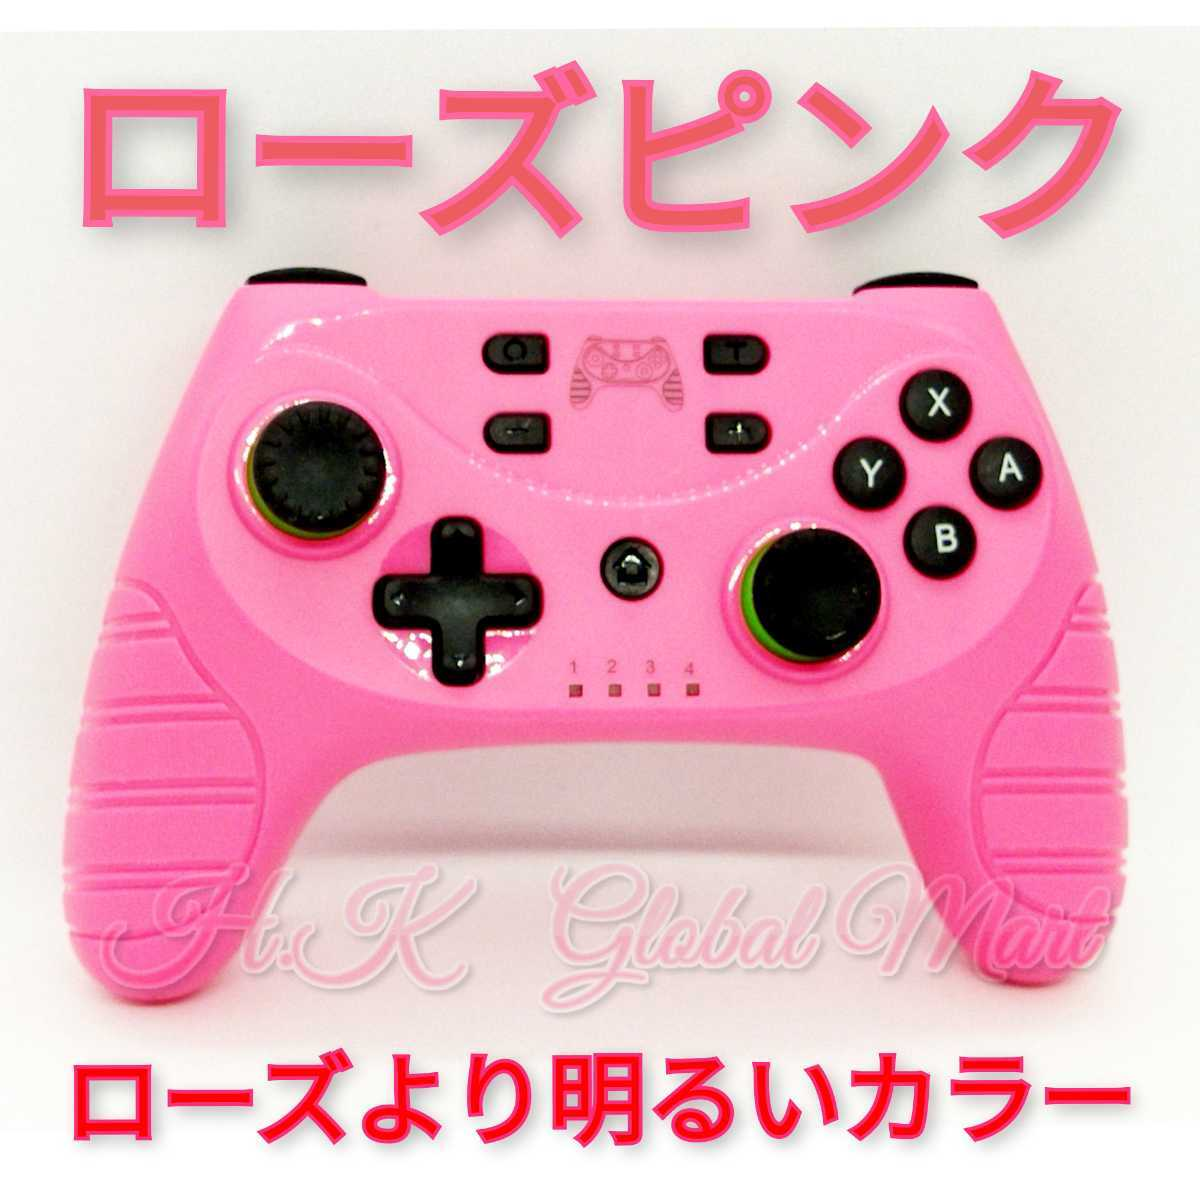 Switchコントローラー Bluetooth Nintendo Switch Proコントローラー ピンク系 大人気モデル